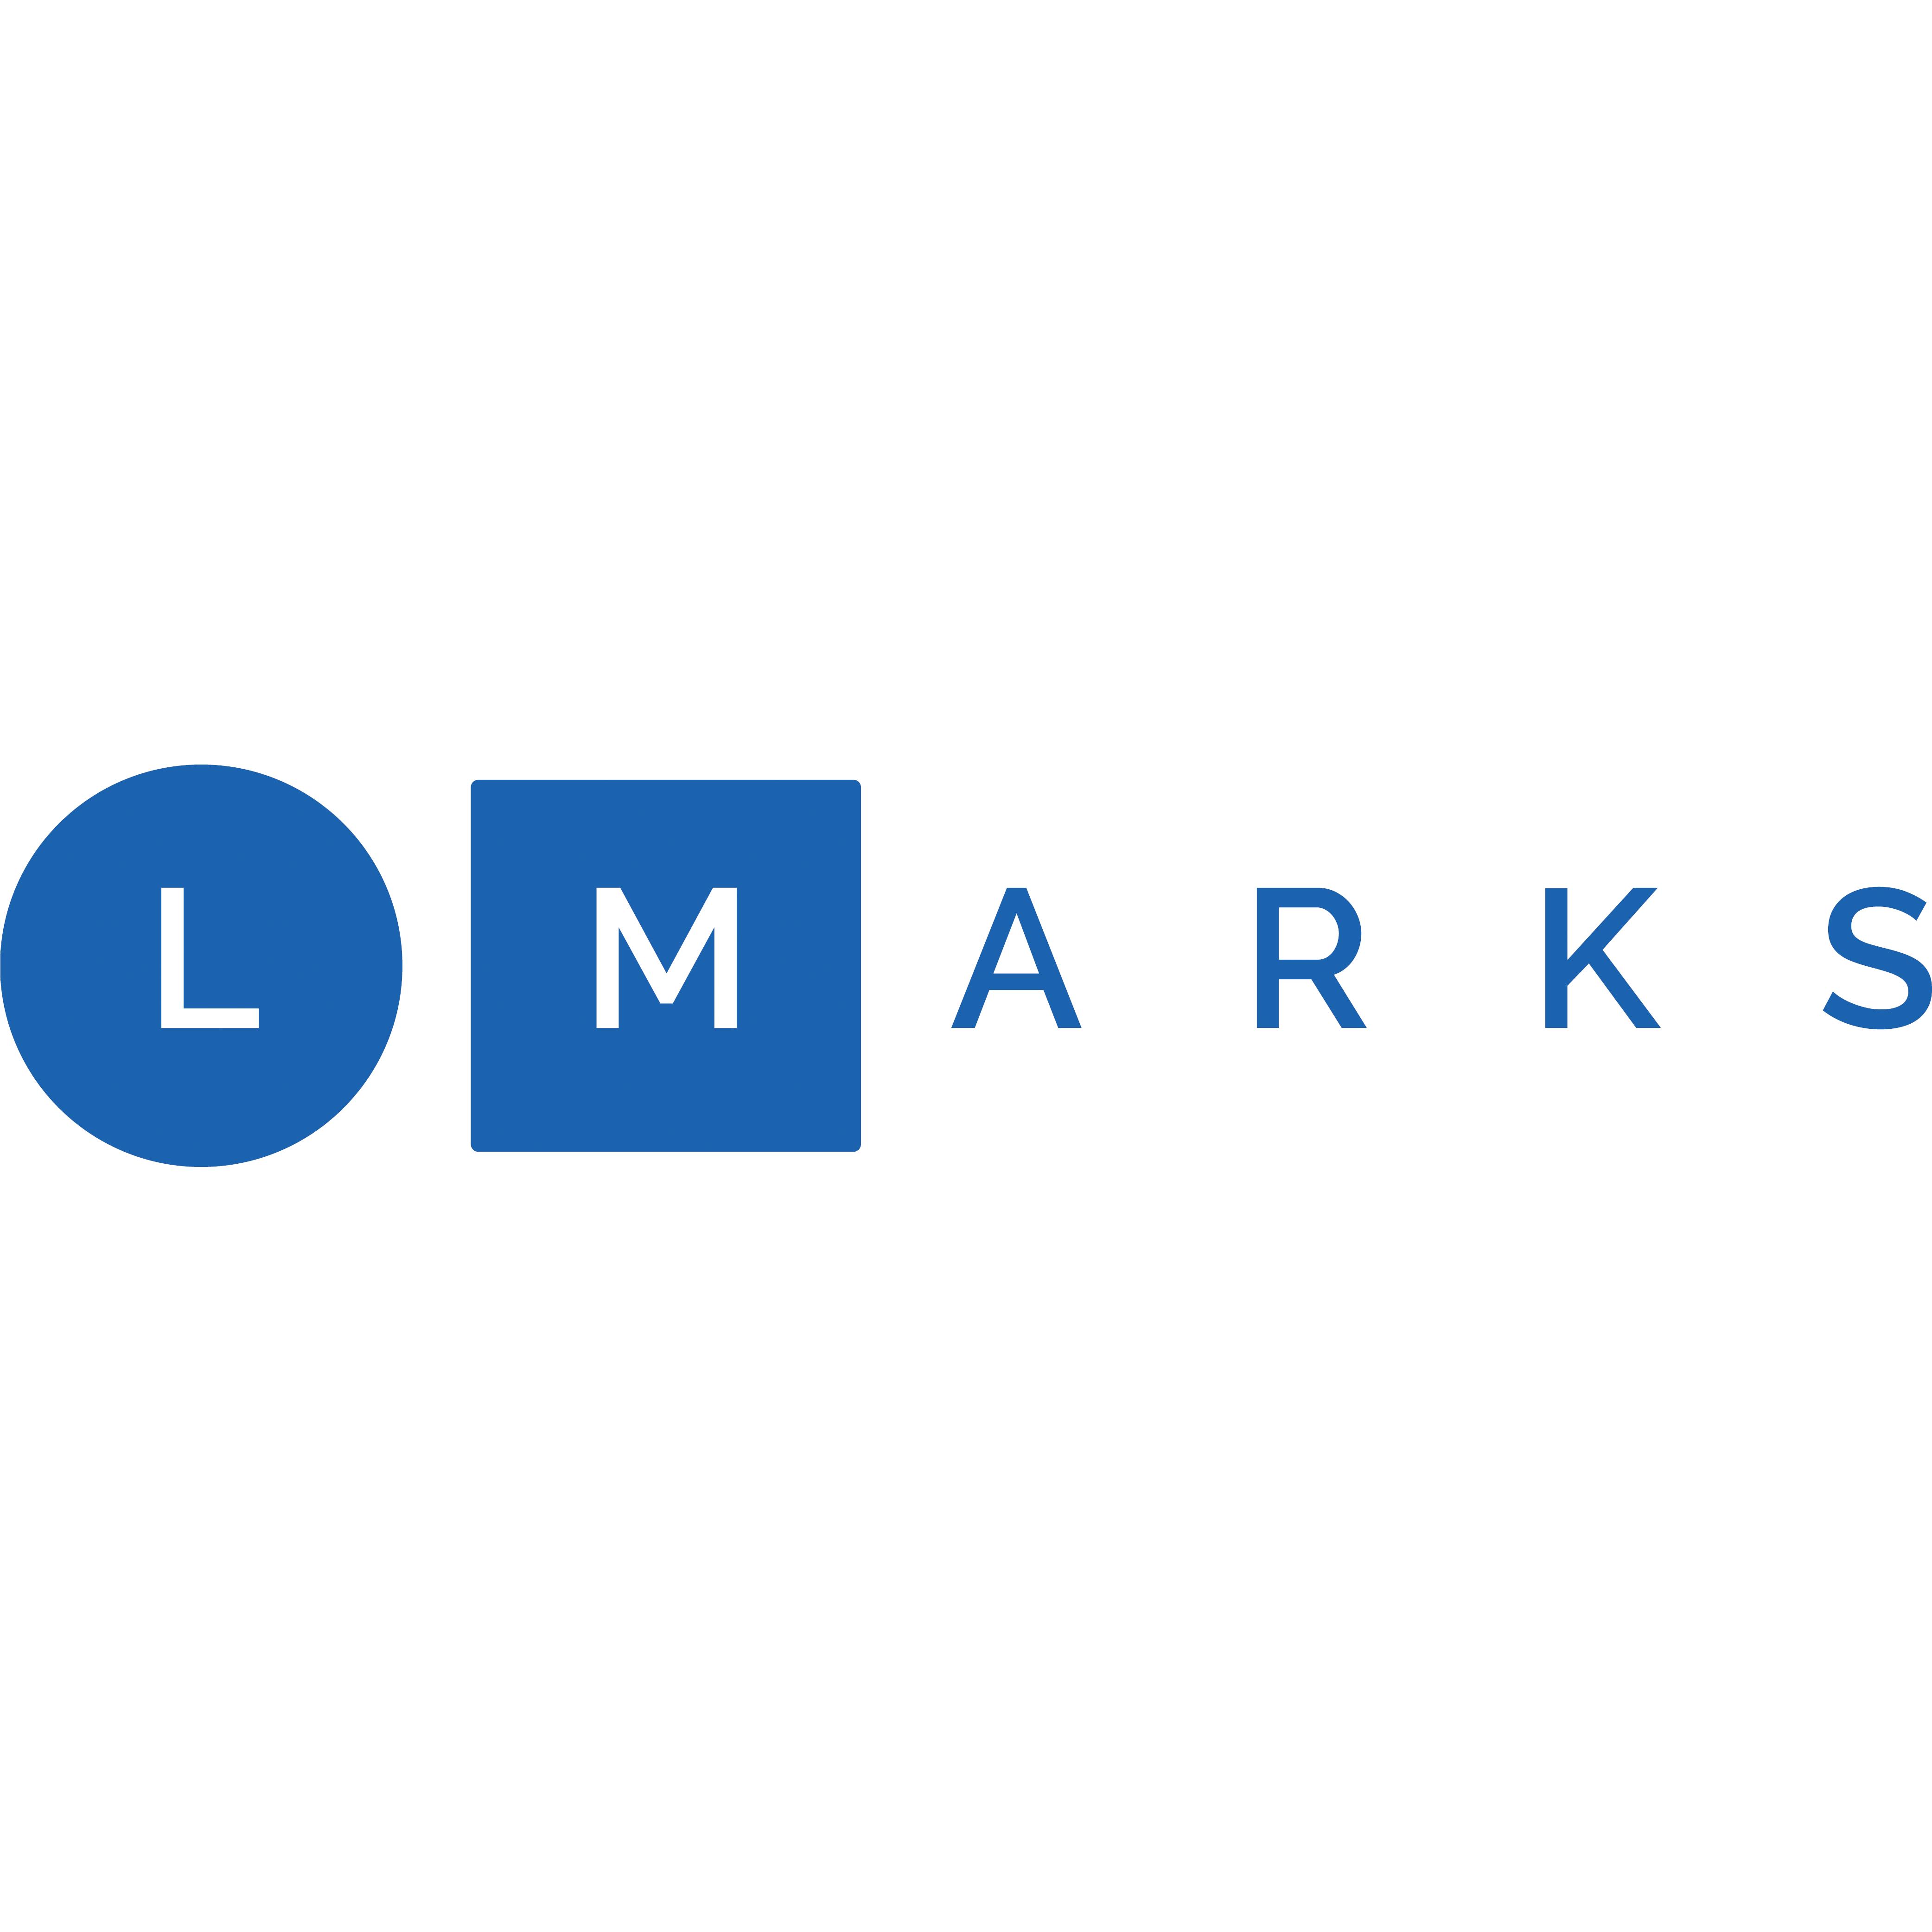 L Marks logo